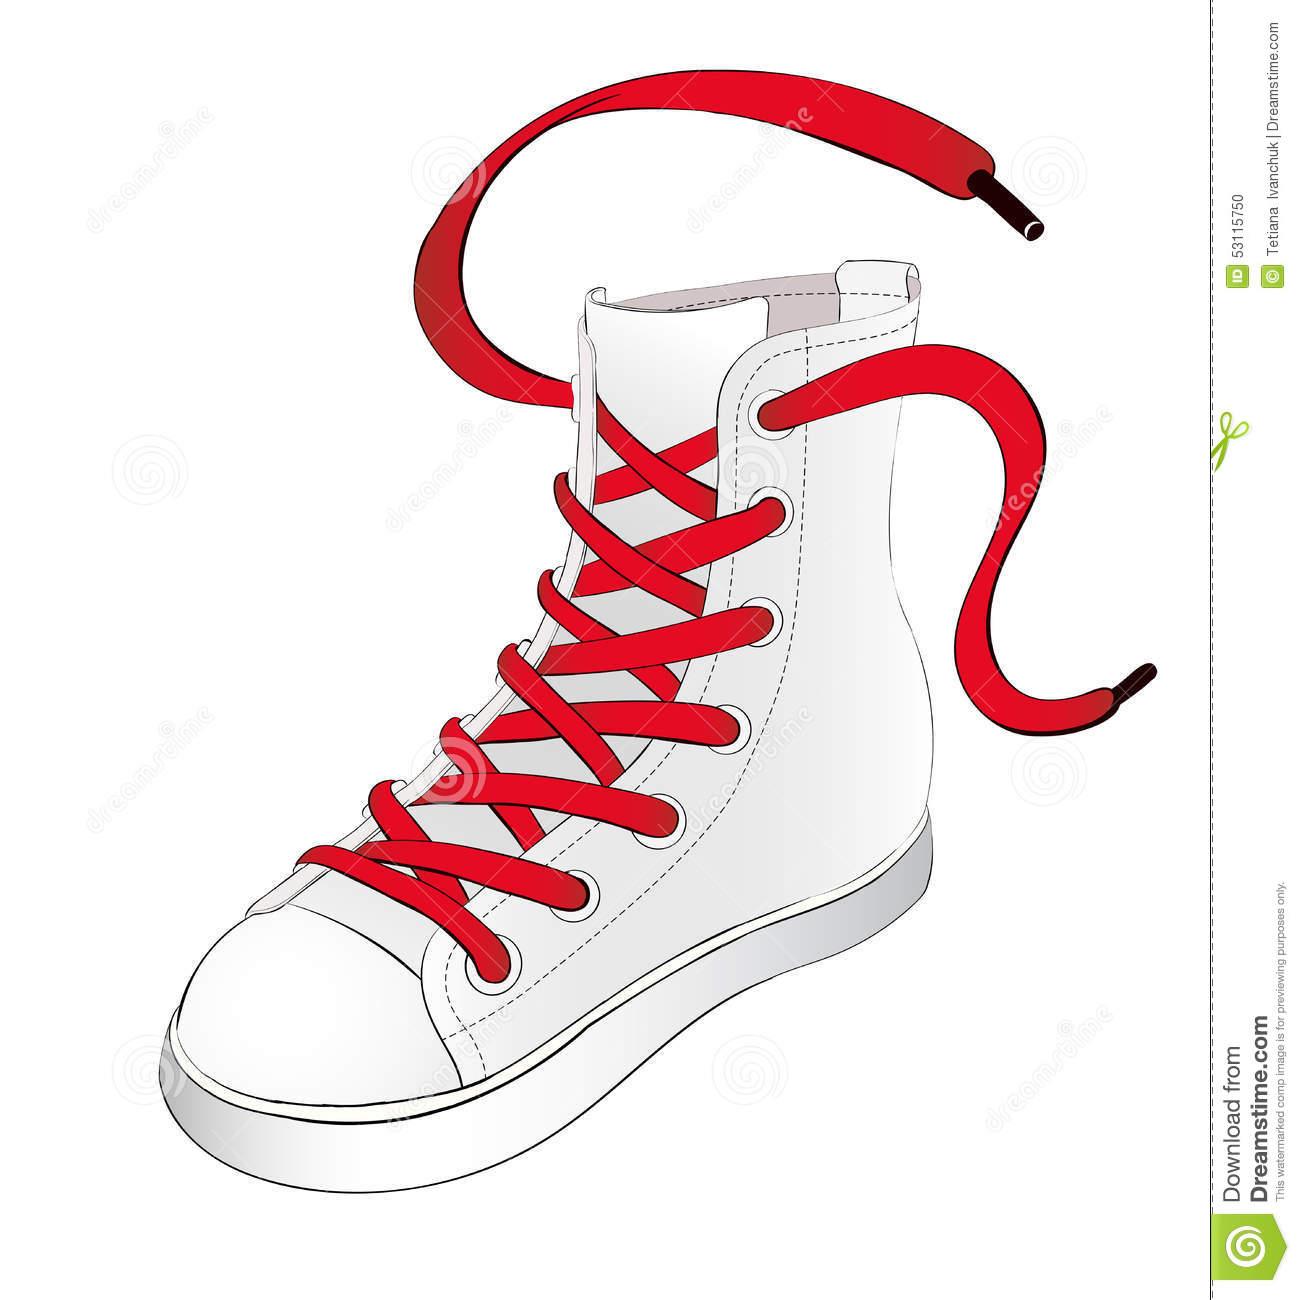 Adidas clipart untied shoe Vvisitingmexico Shoelaces Source: Shoelaces Report